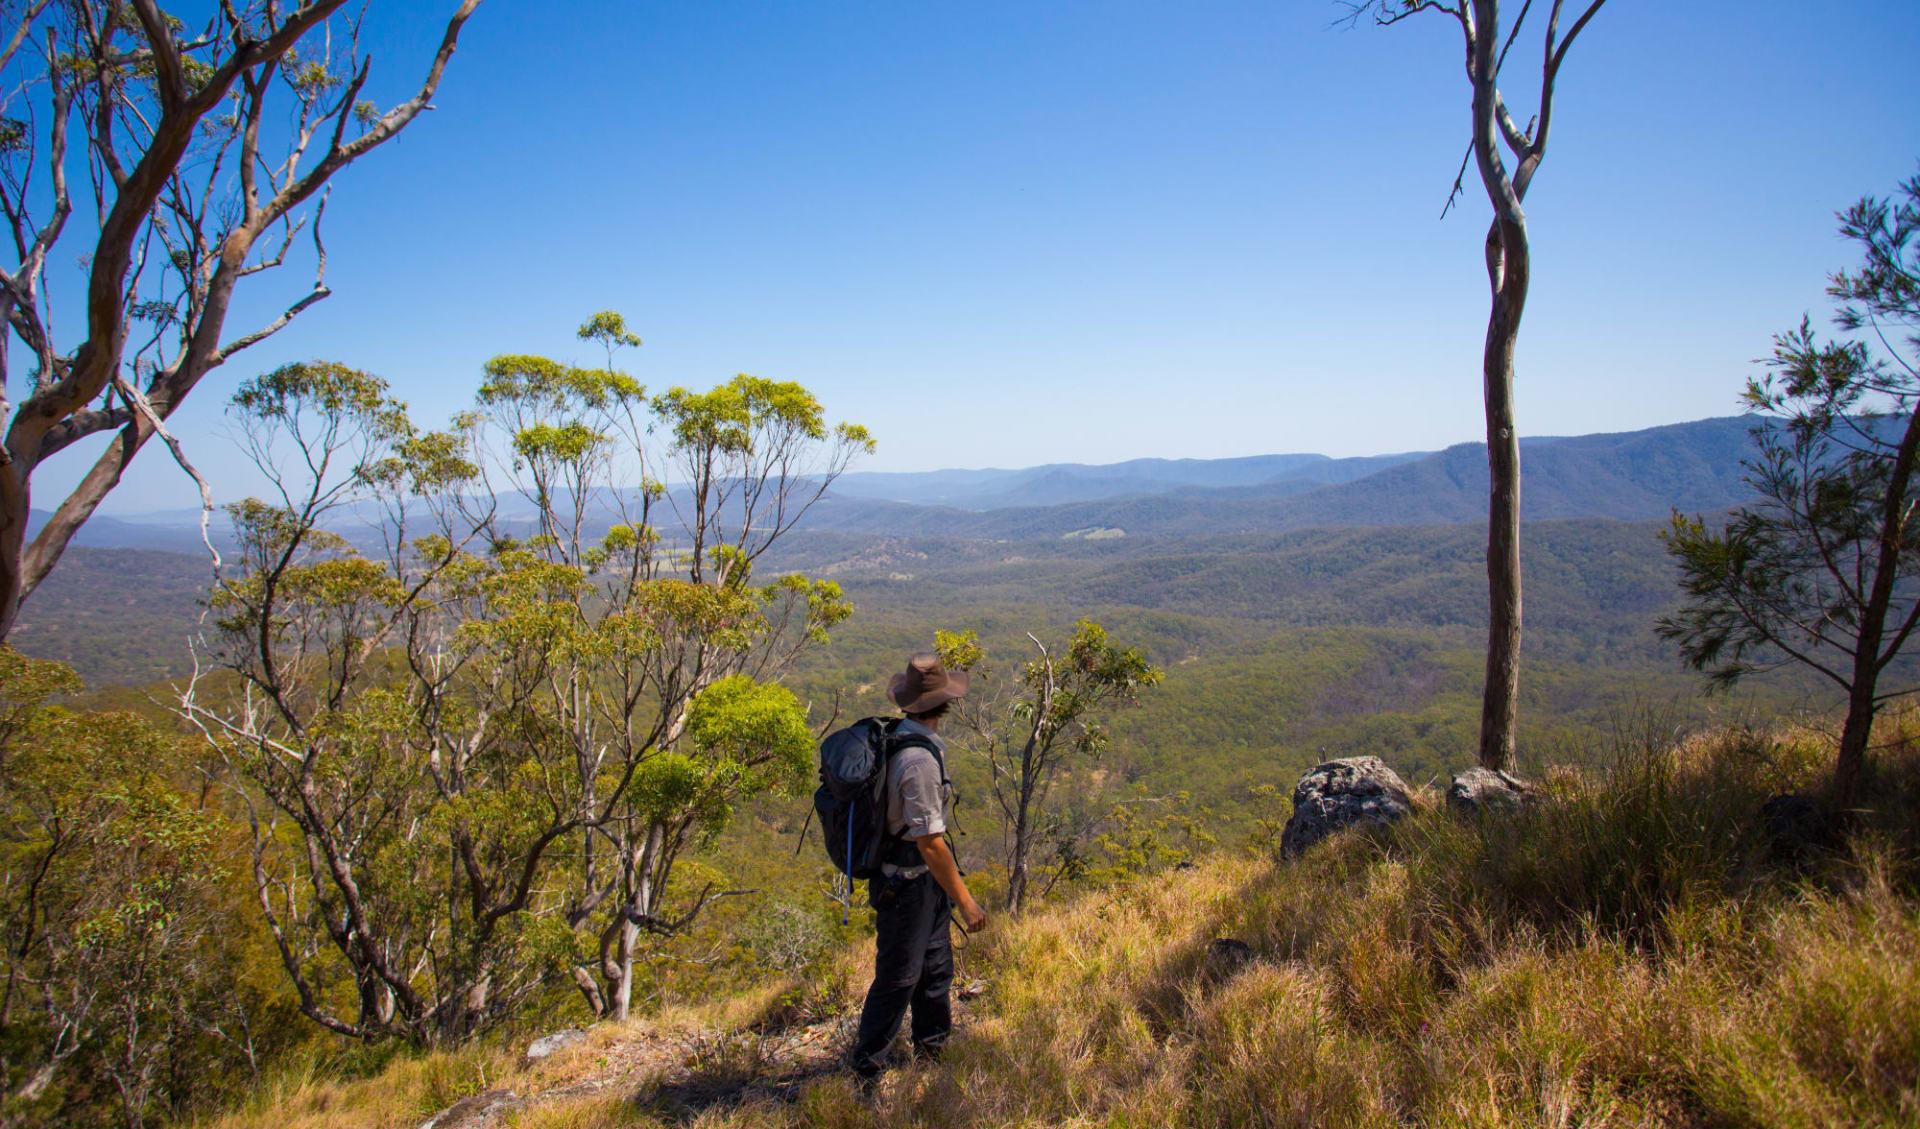 Scenic Rim Trail ab Brisbane: Australia - Queensland - Scenic Rim Trail - Bergwanderer